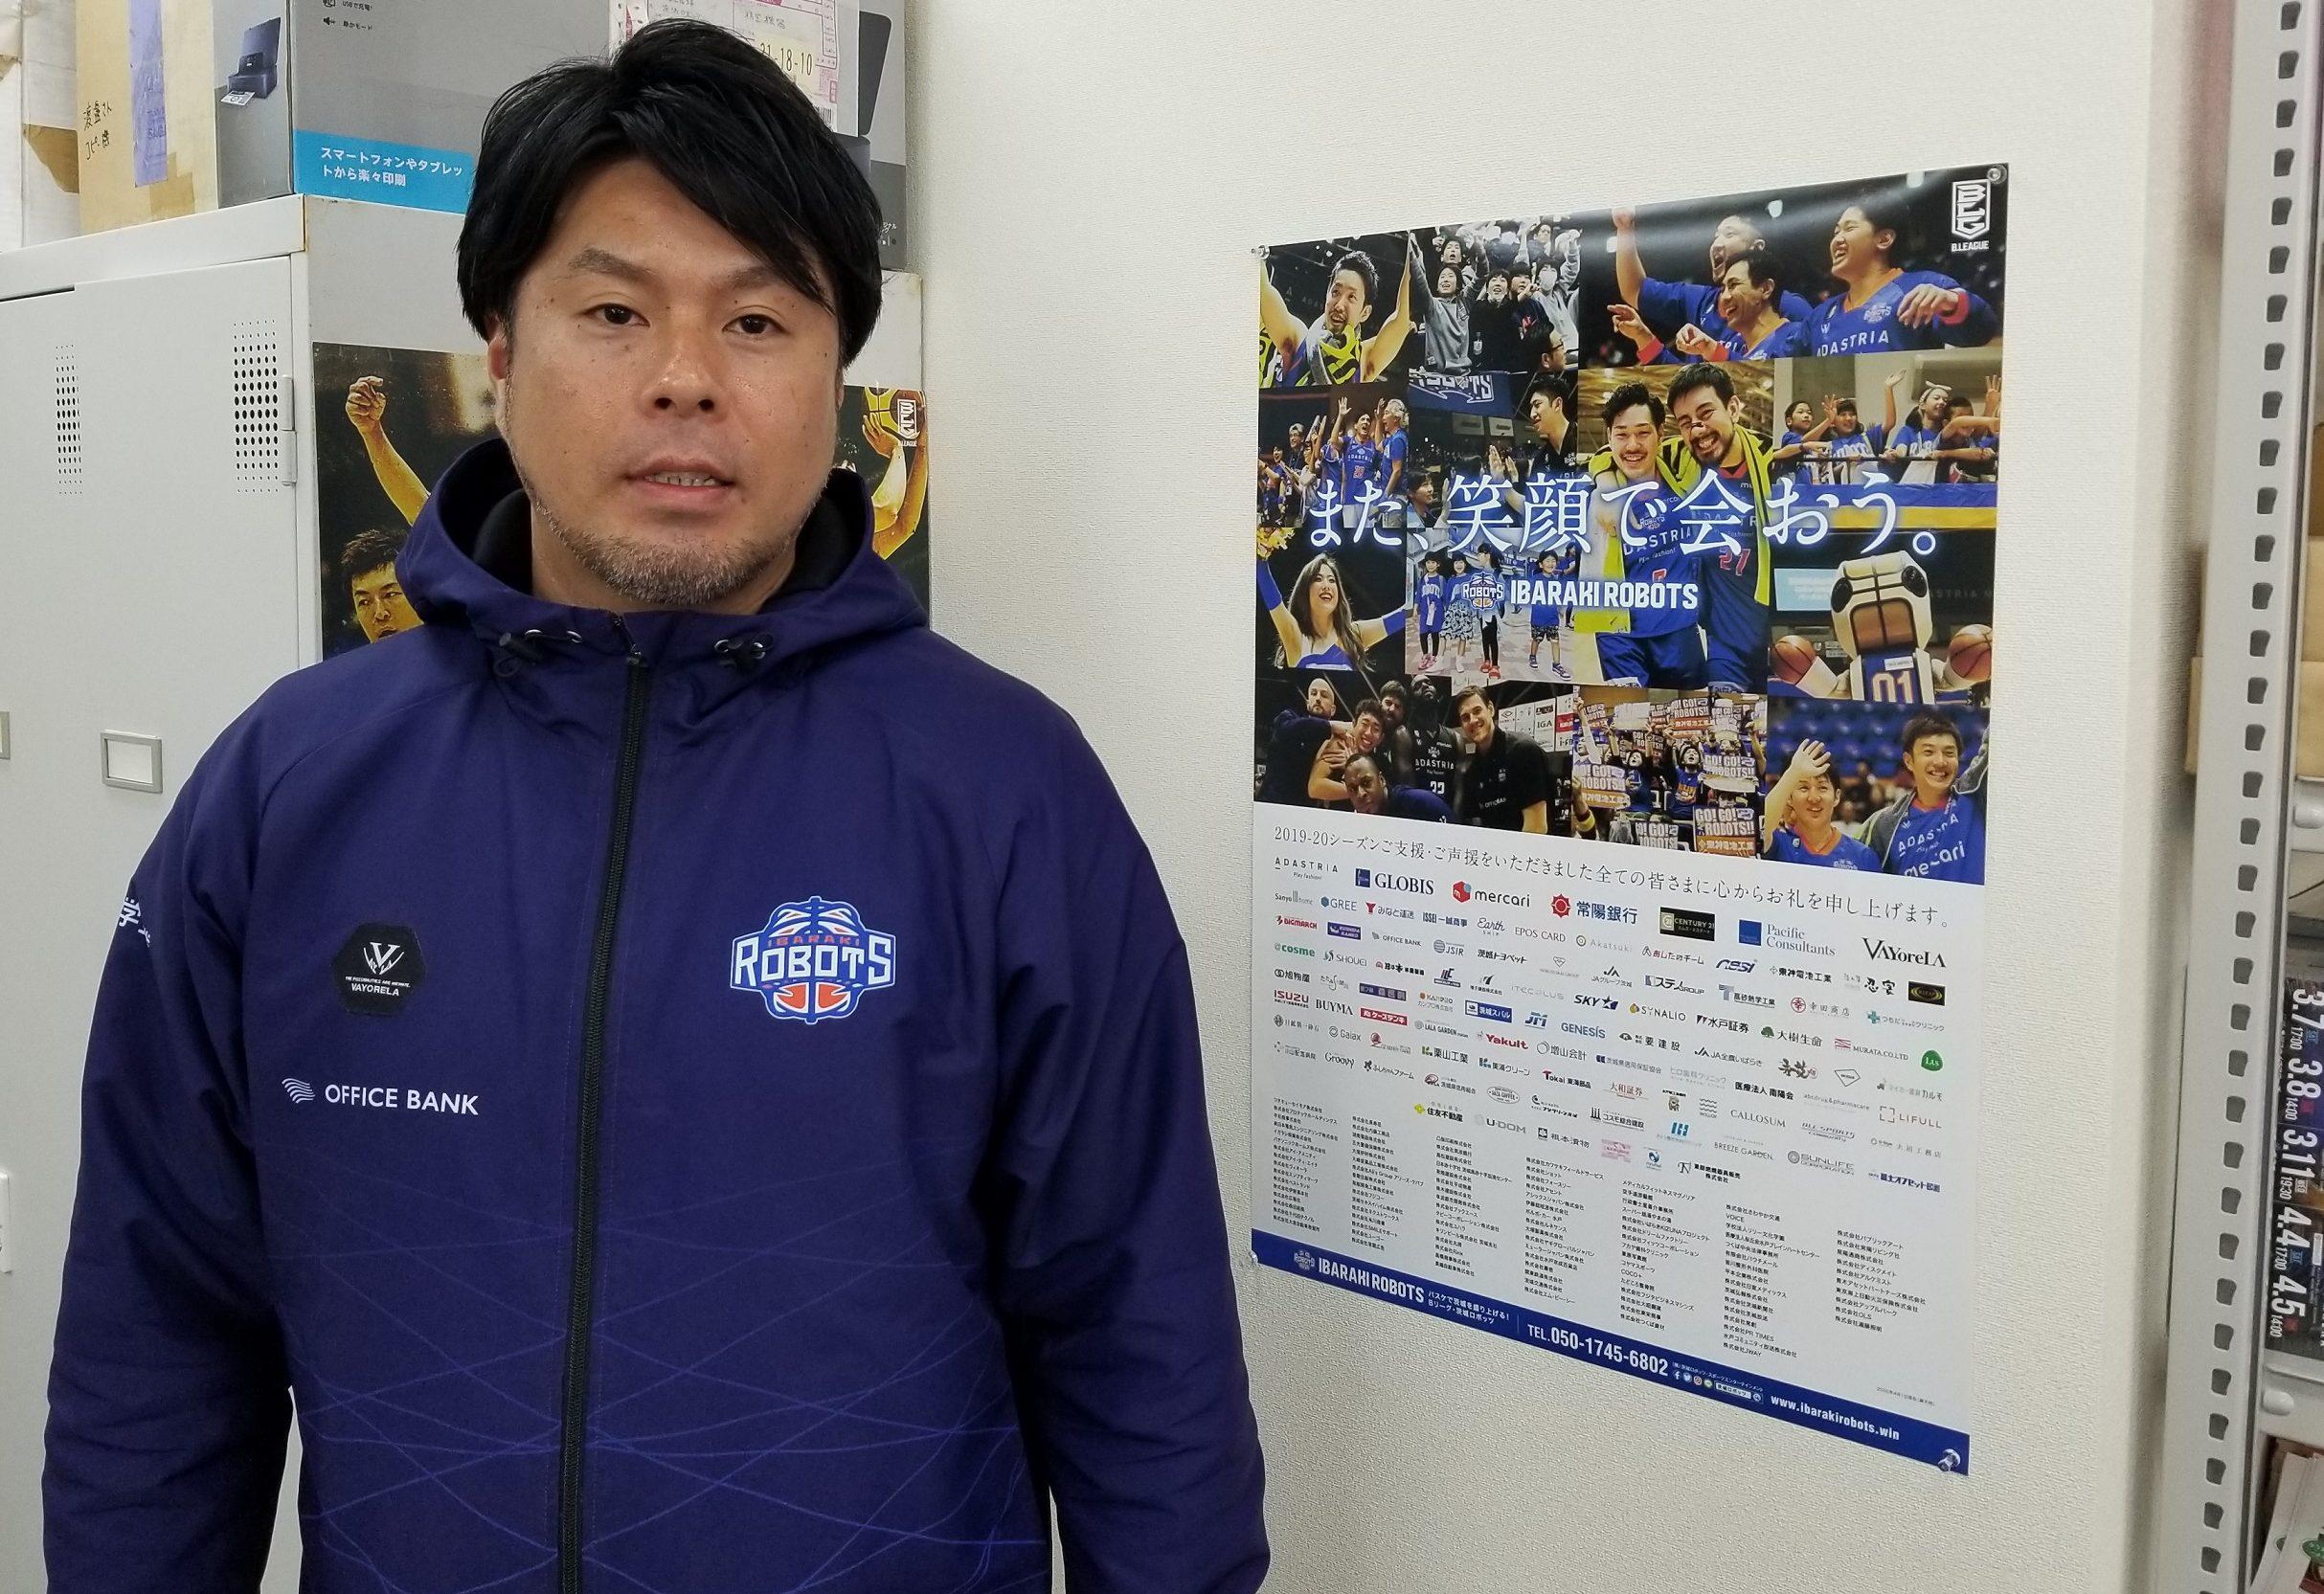 「RUN as ONE~一丸疾走~」2019-20シーズンを振り返ってー上原和人GM篇ー